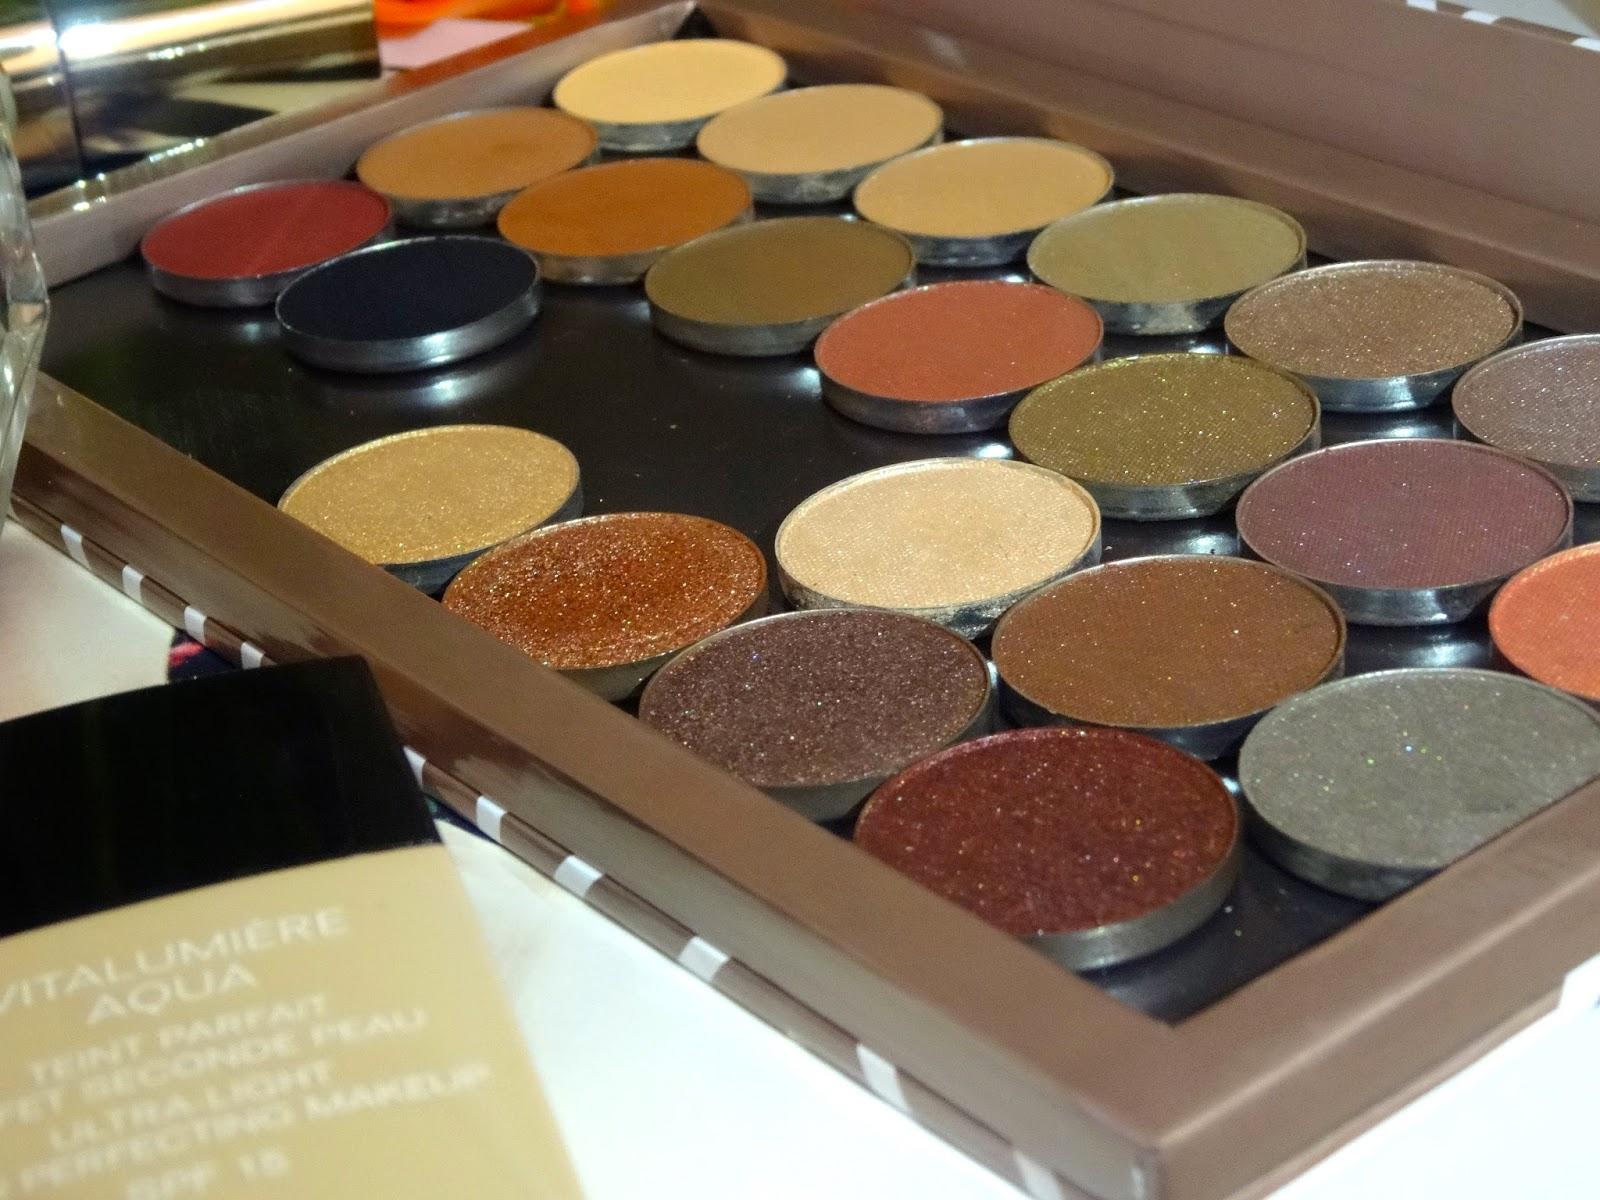 Anatasia Beverly Hills contour kit, Makeup Geek, Chanel vitalumiere aqua, nars lip pencil, l'oreal, Jo Malone